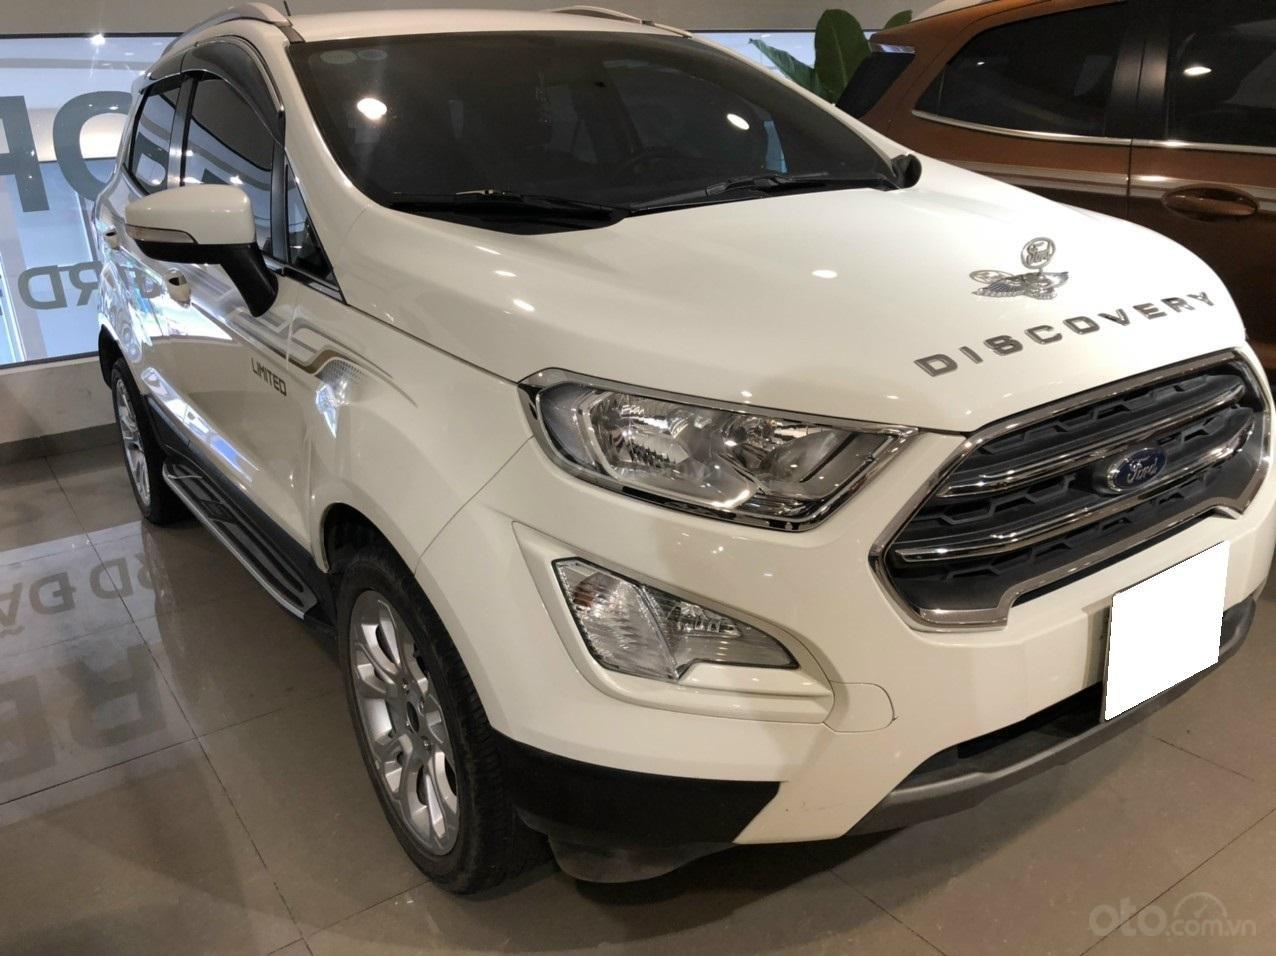 Ecosport Titanium 219 trắng xe đẹp cho mọi người (2)